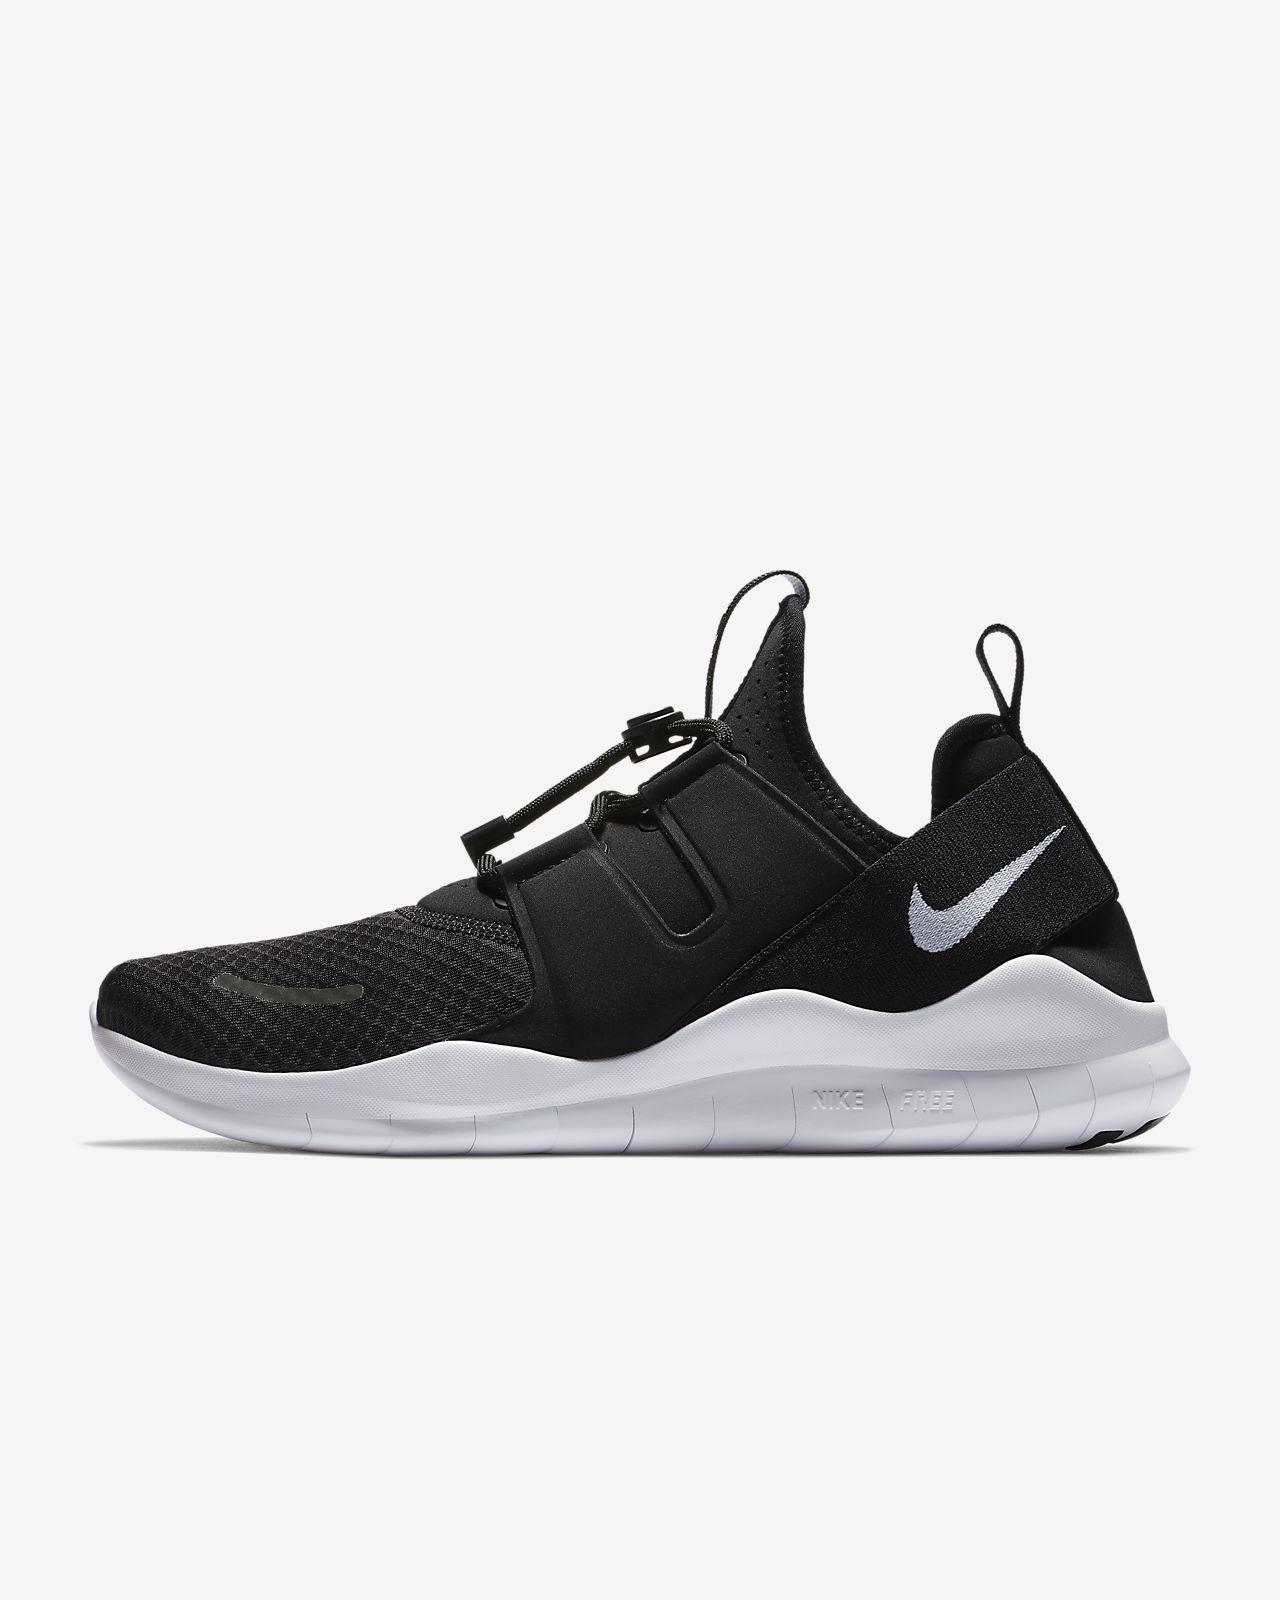 31878e78fc1e6 43315 f7209  discount nike free rn commuter 2018 mens running shoe b86d1  0db9e